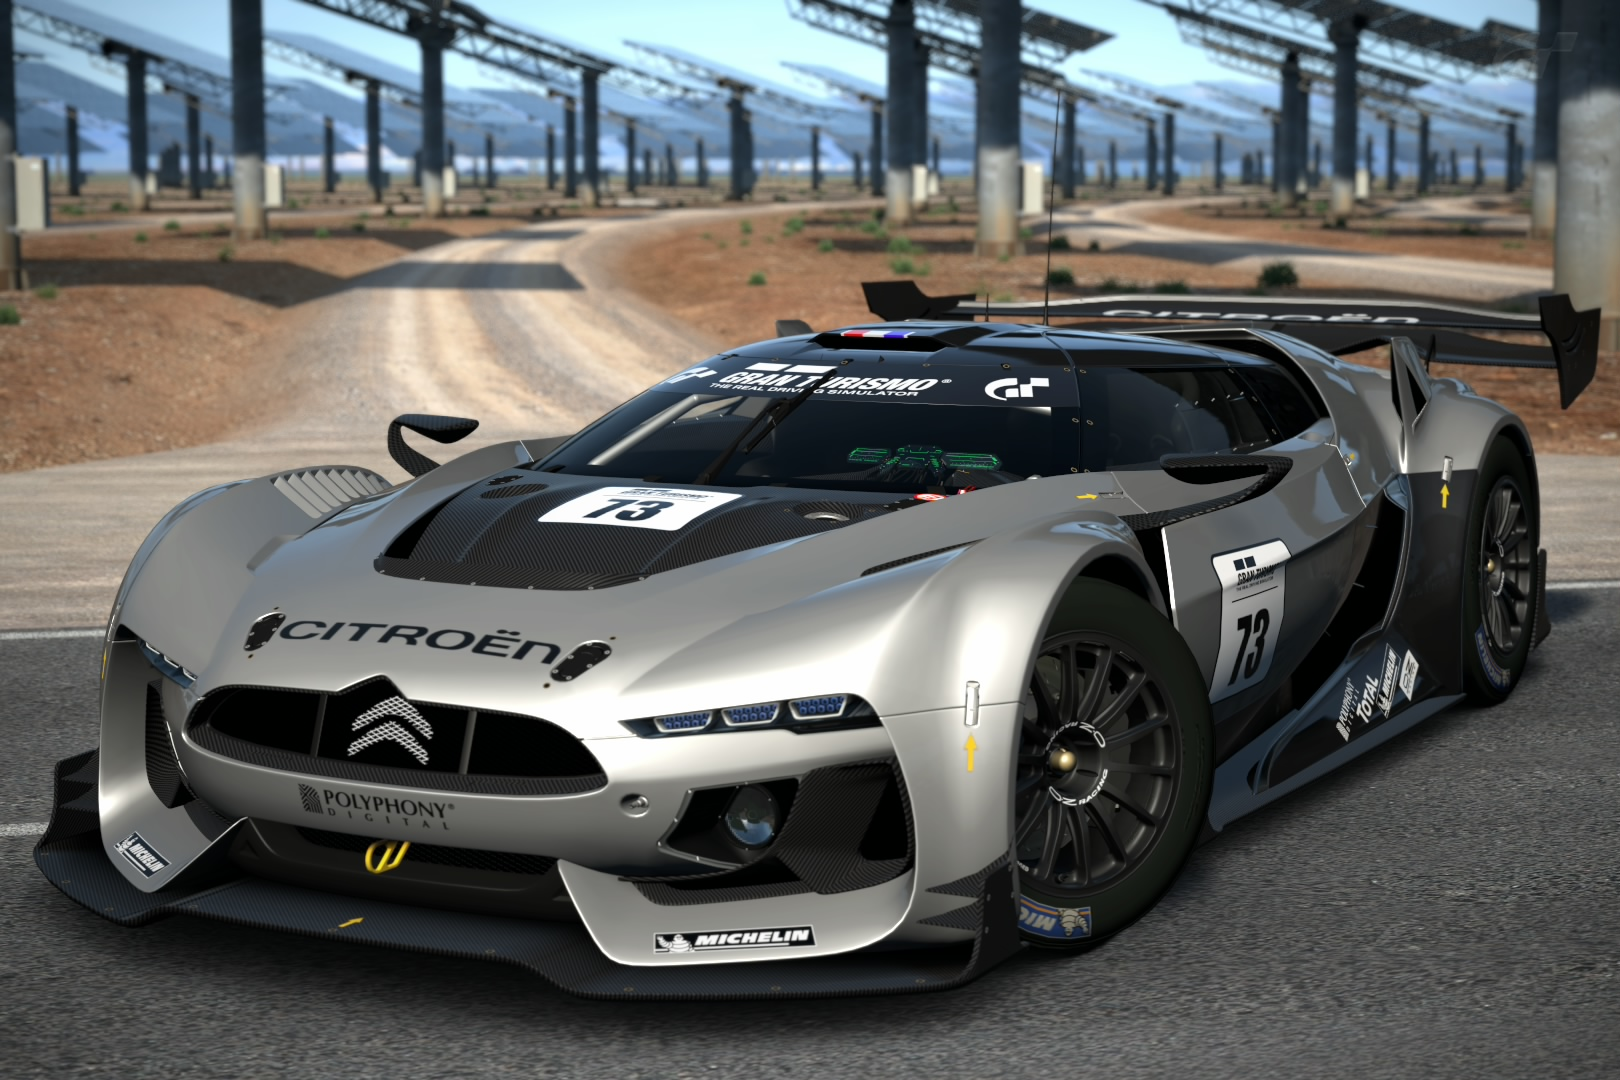 Spec Racer Ford >> GT by Citroën Race Car   Gran Turismo Wiki   Fandom